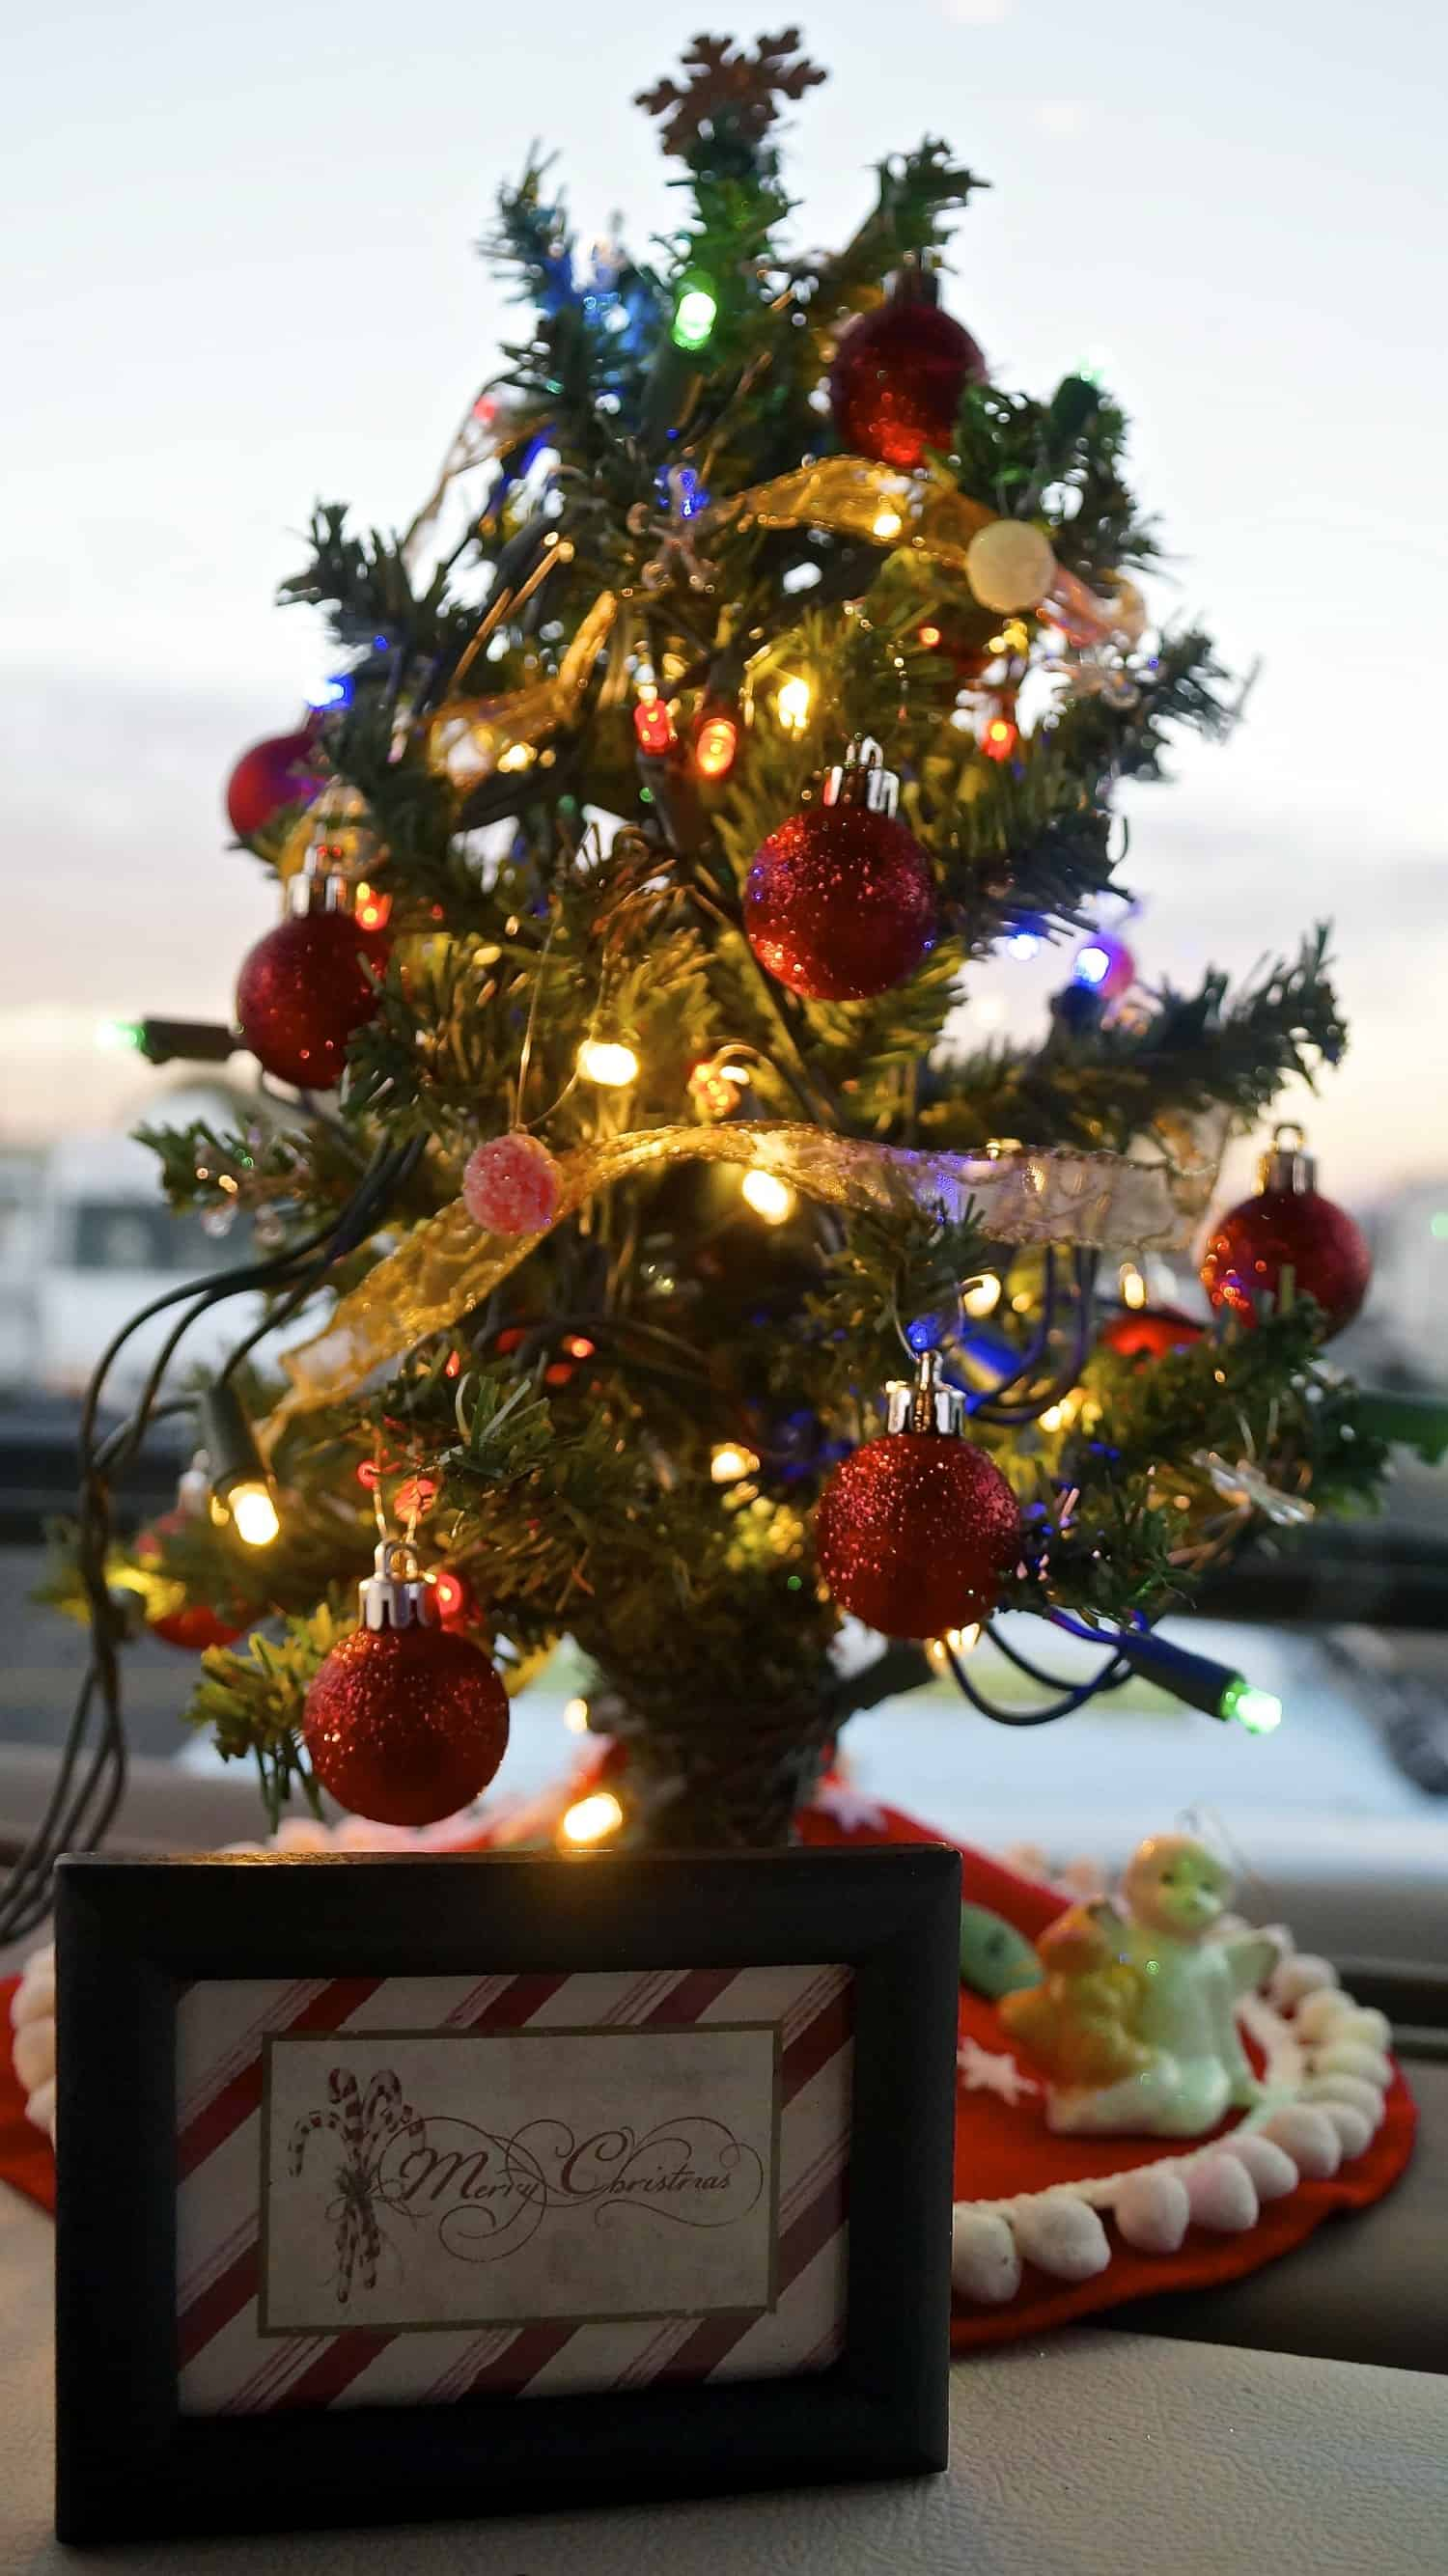 Tiny Christmas Tree in the Motorhome